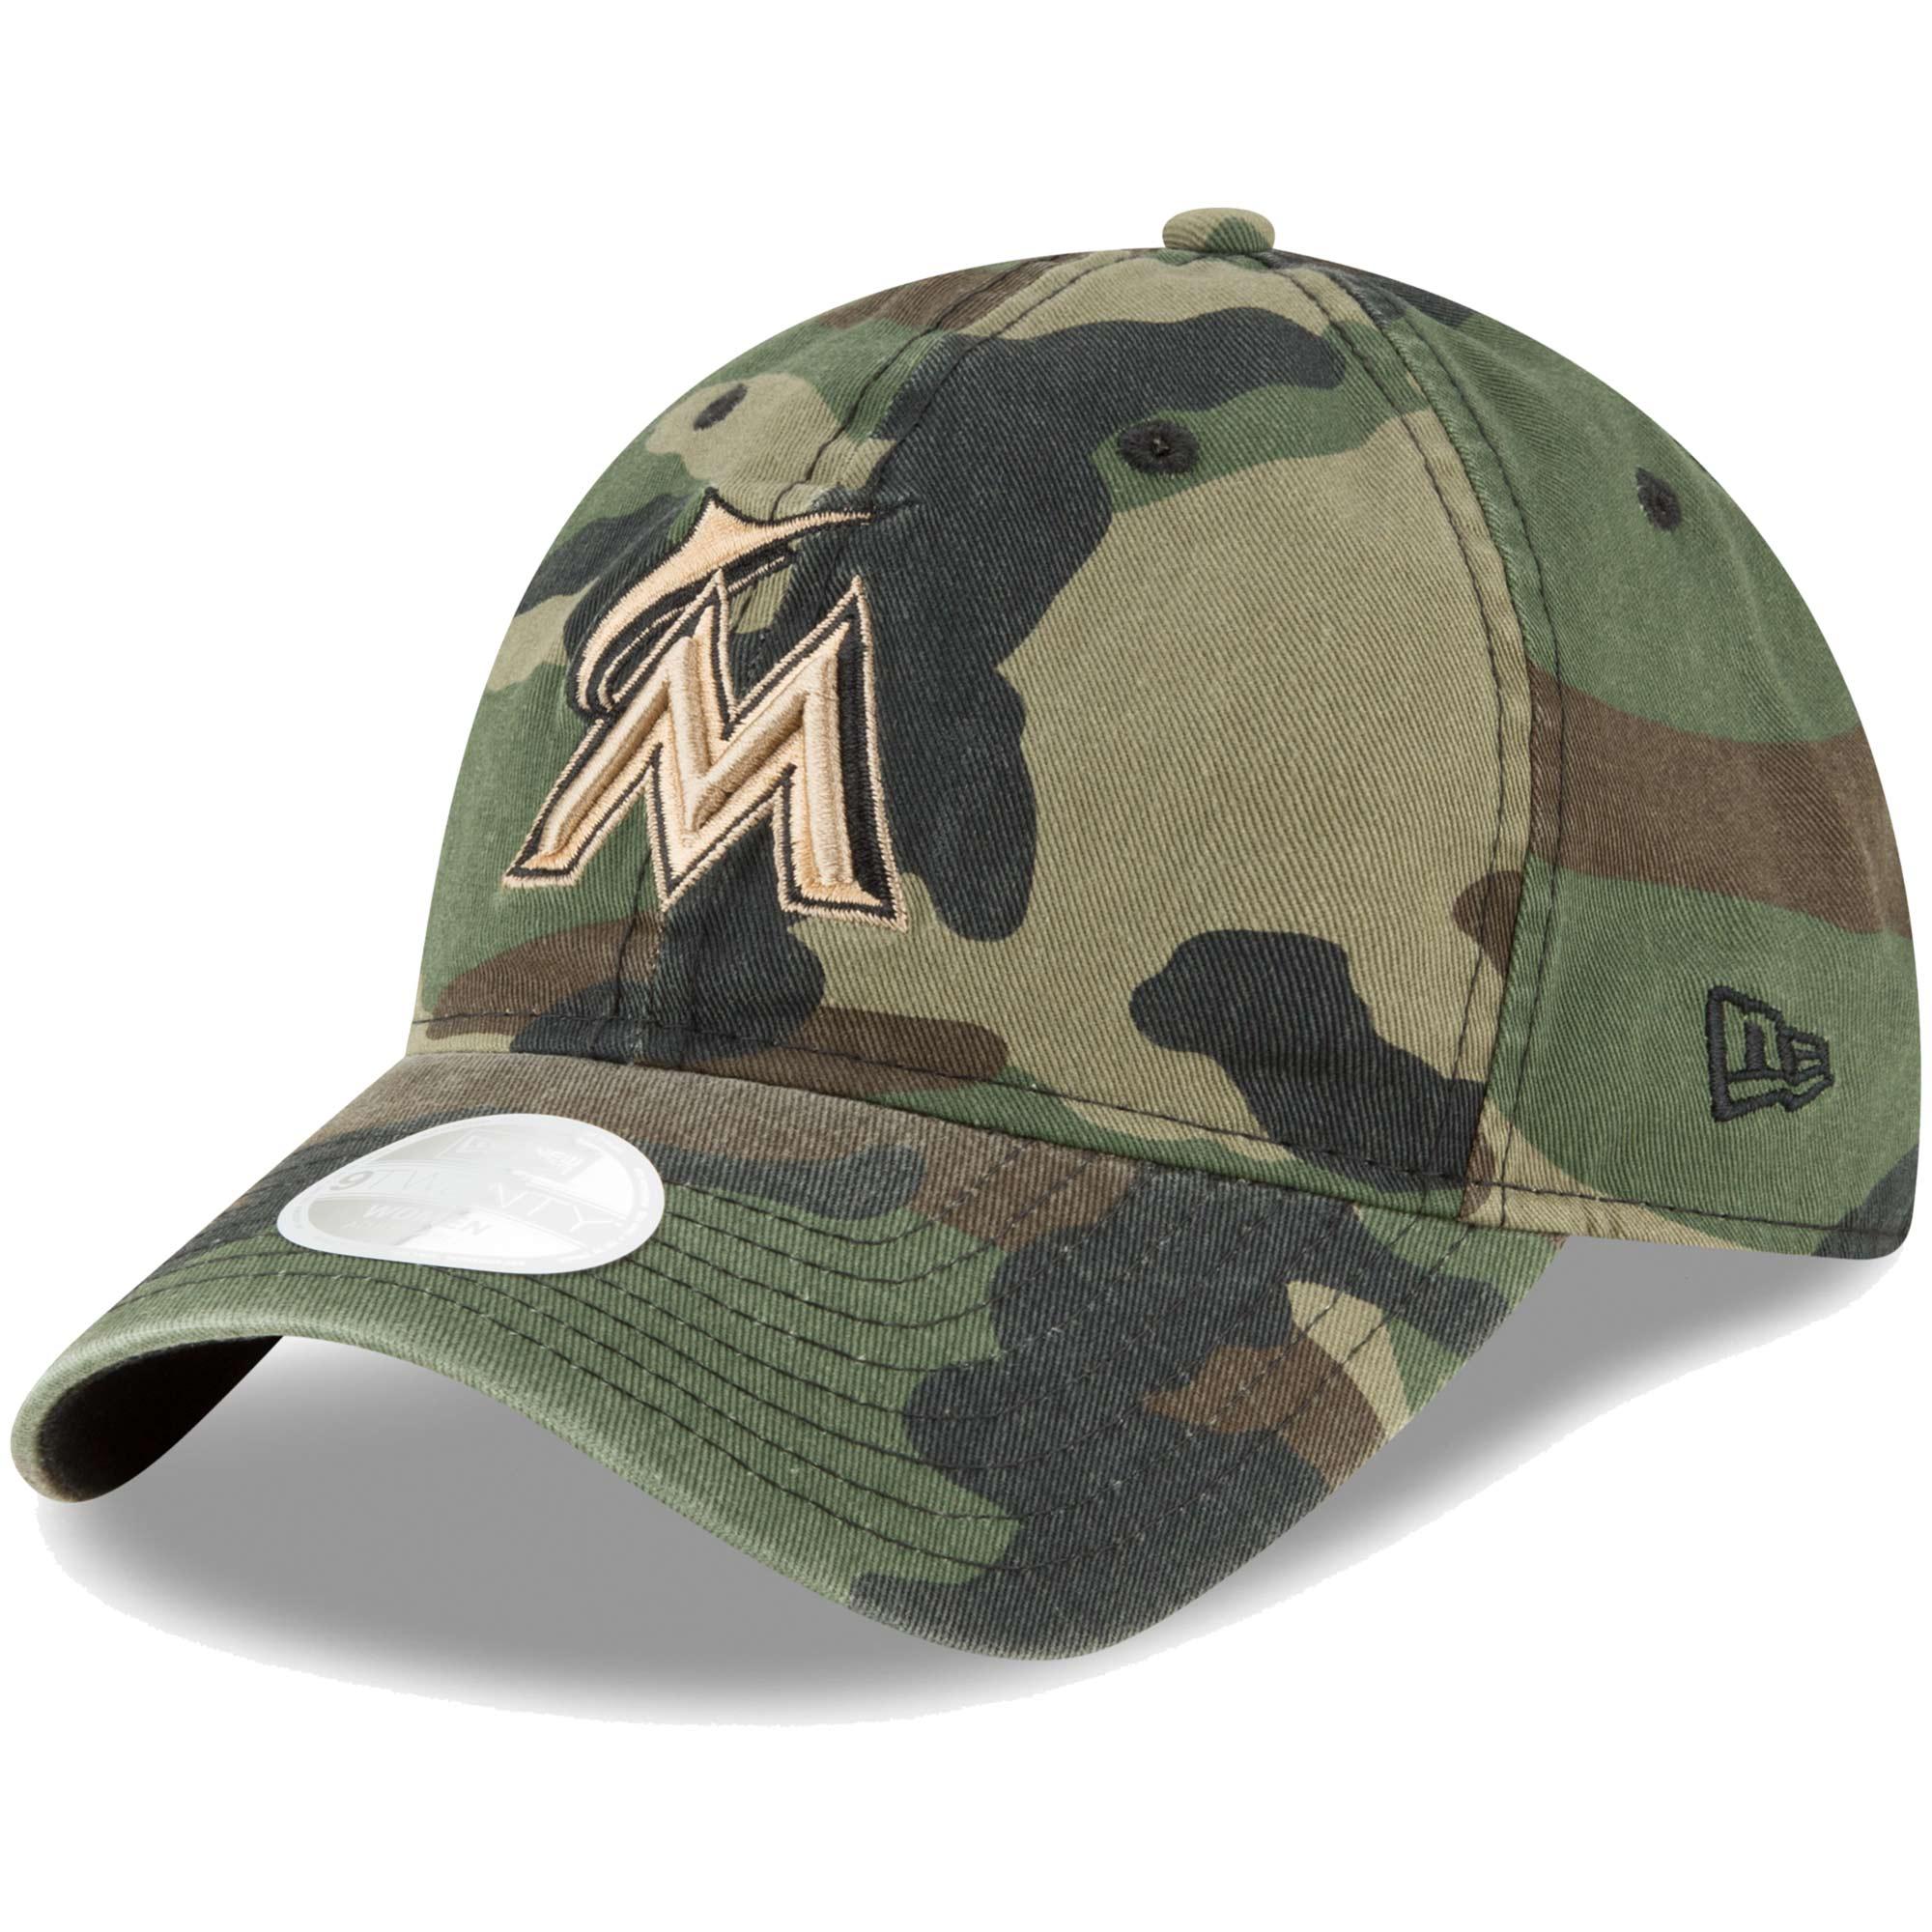 Miami Marlins New Era Women's Core Classic Twill 9TWENTY Adjustable Hat - Camo - OSFA